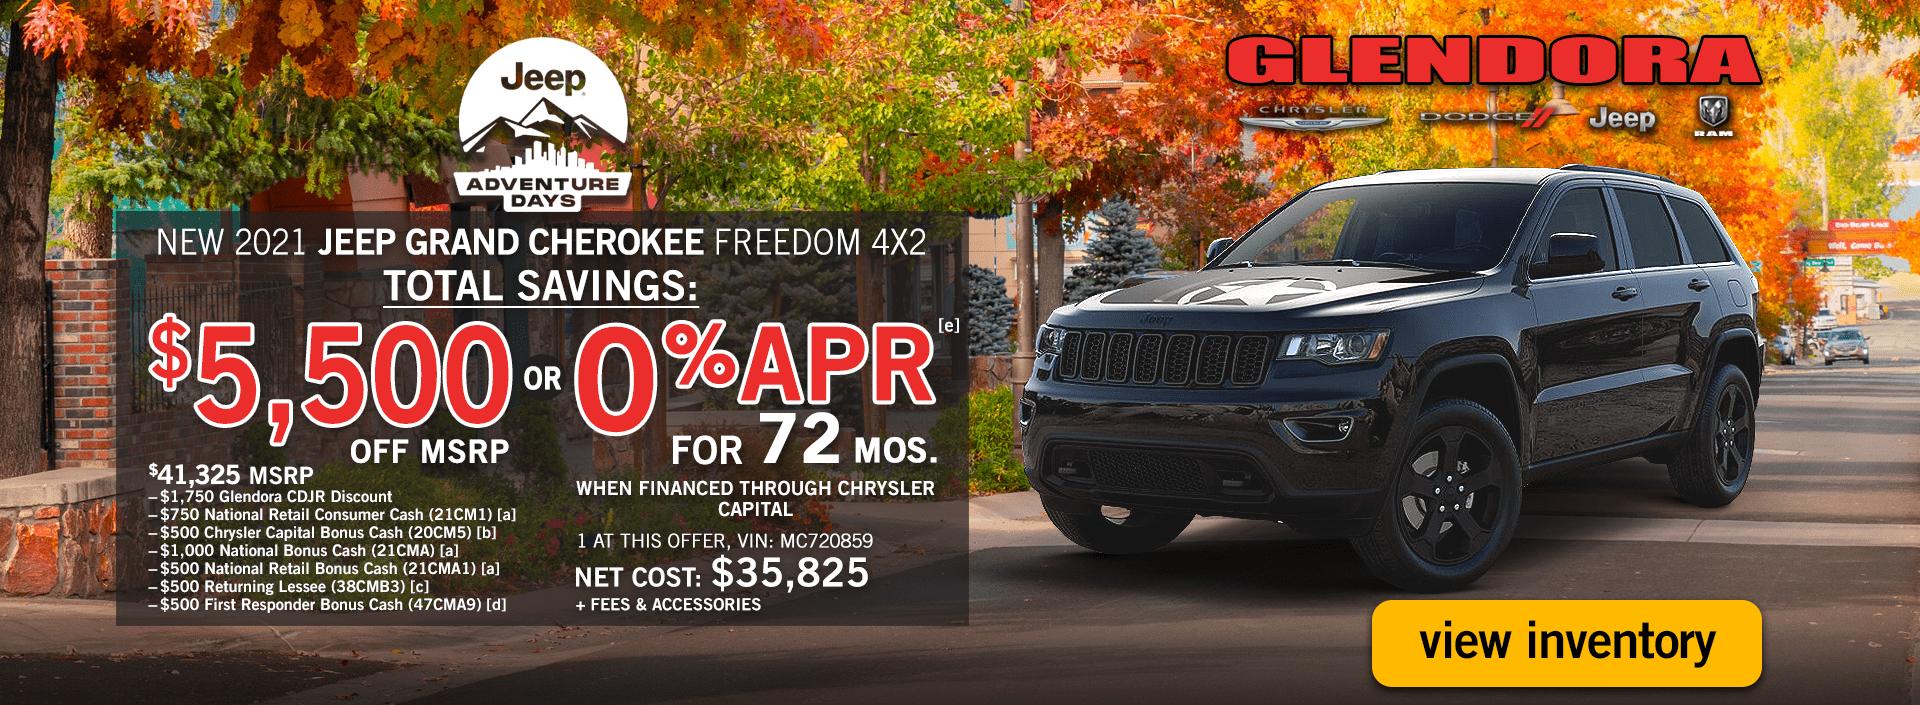 Glendora_CDJR_2021_September_Jeep_Adventure_Days_Jeep_Grand_Cherokee1